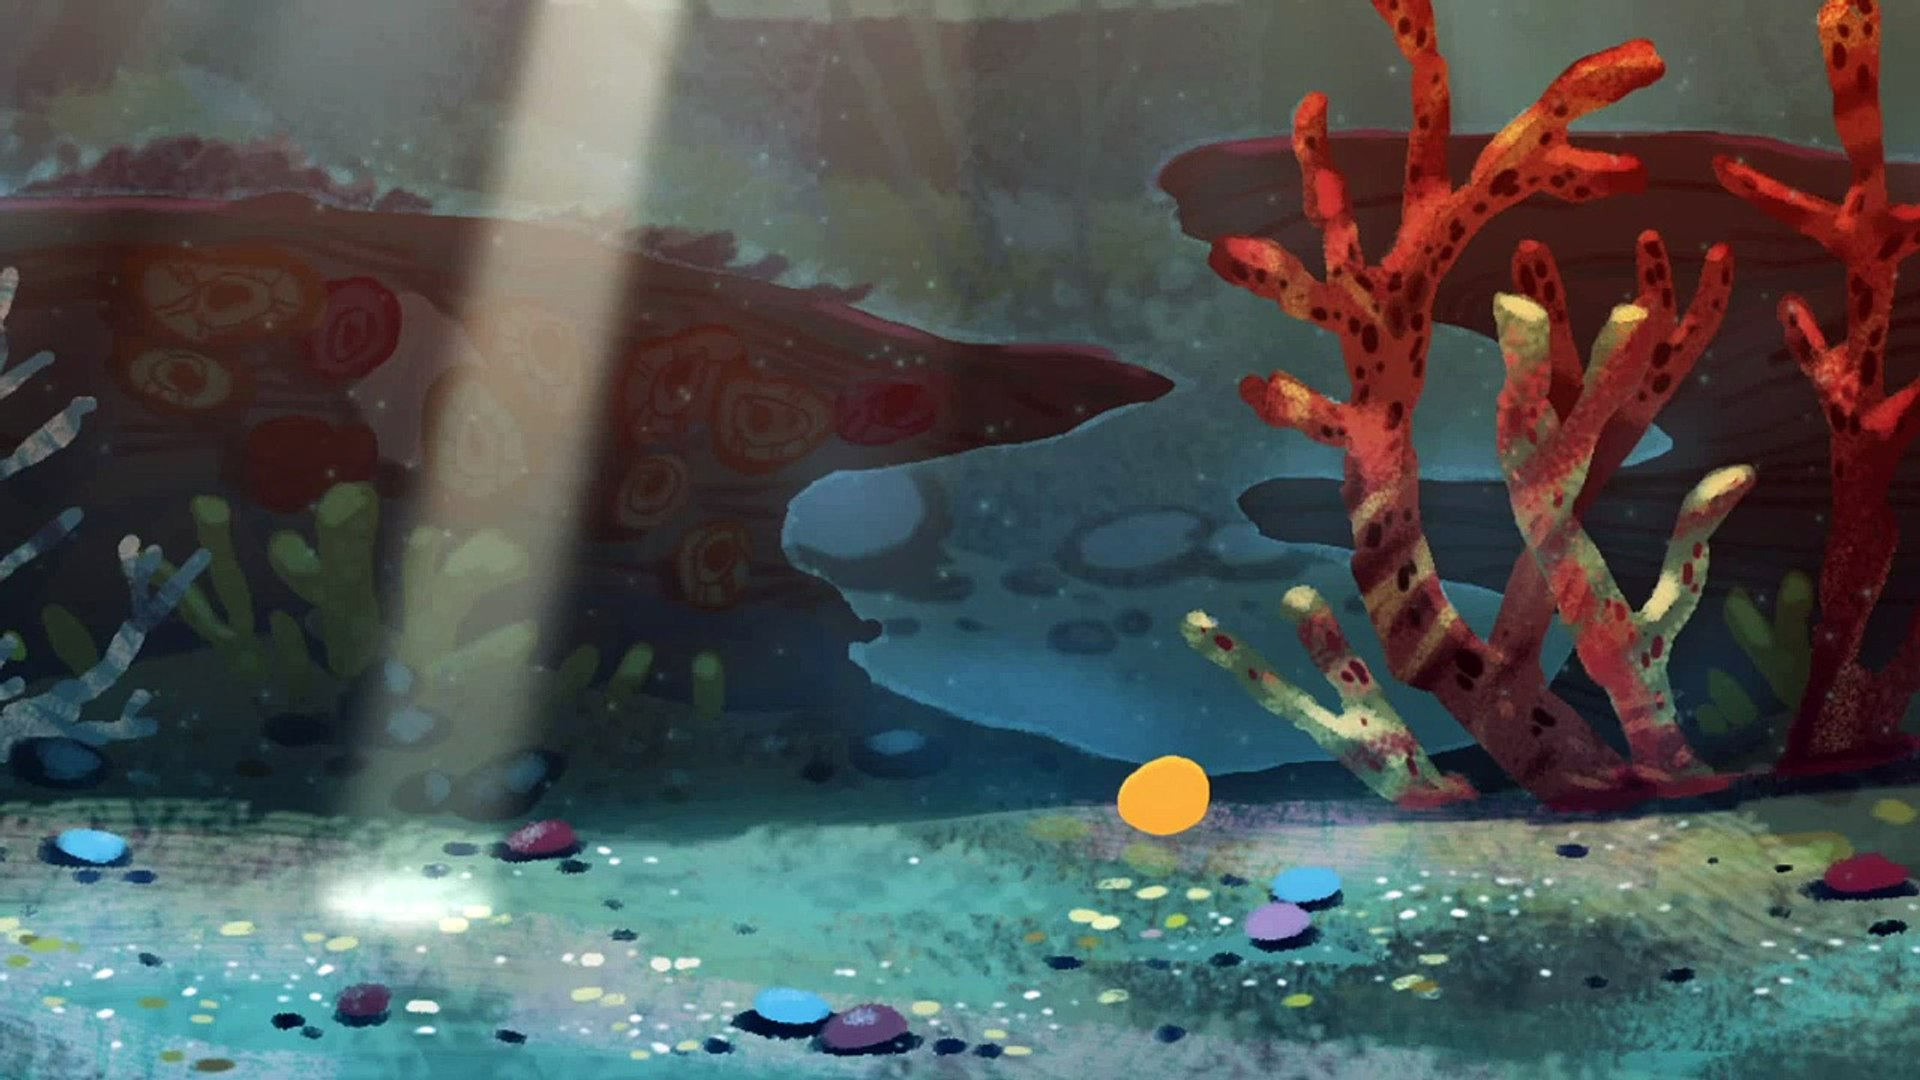 Gold Fish - Золотая рыбка - Animated Cartoon for Children